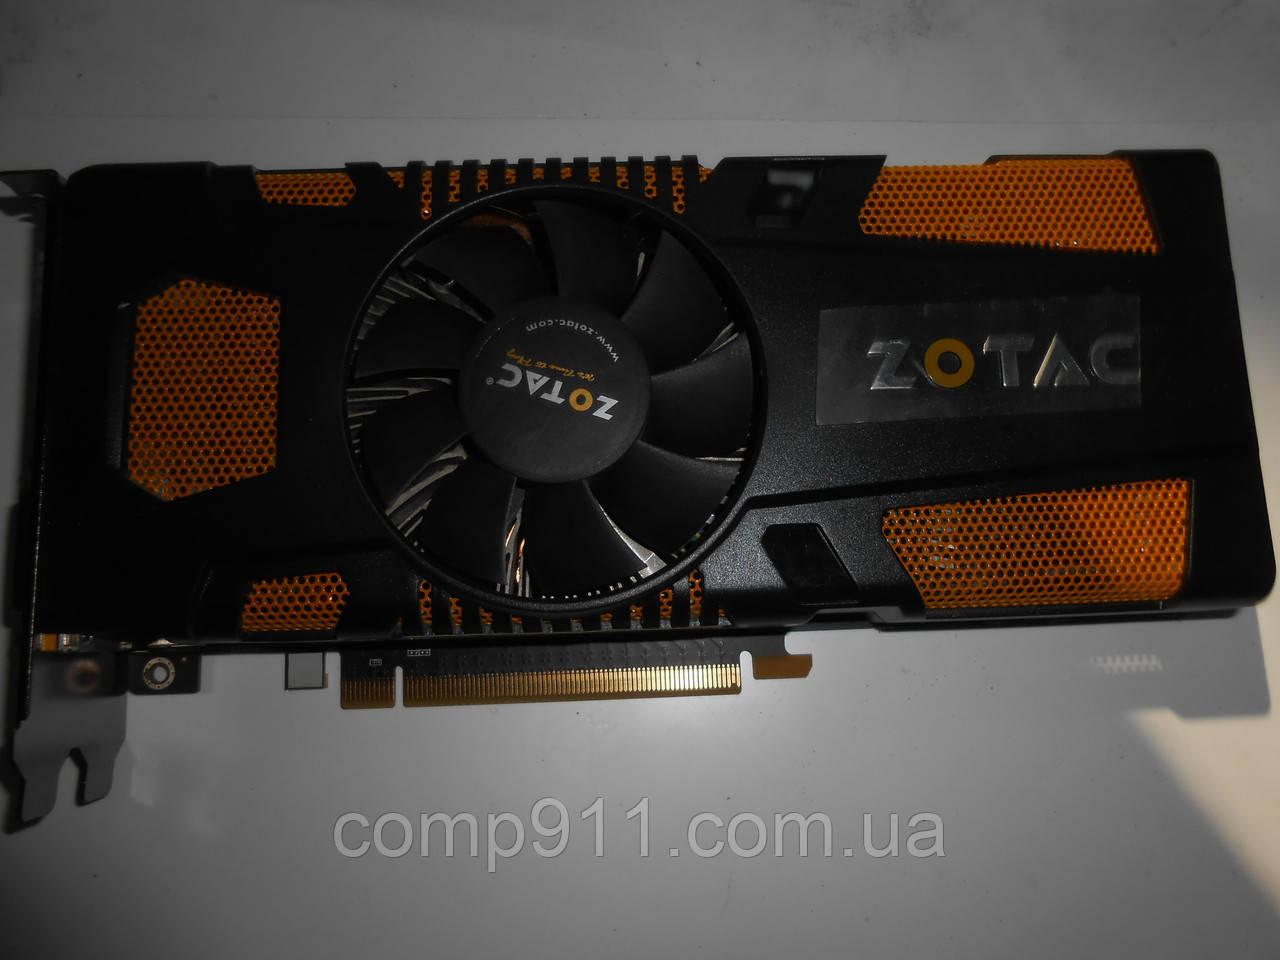 Видеокарта для компьютера Zotac GTX570 1280Mb DDR5 320bit